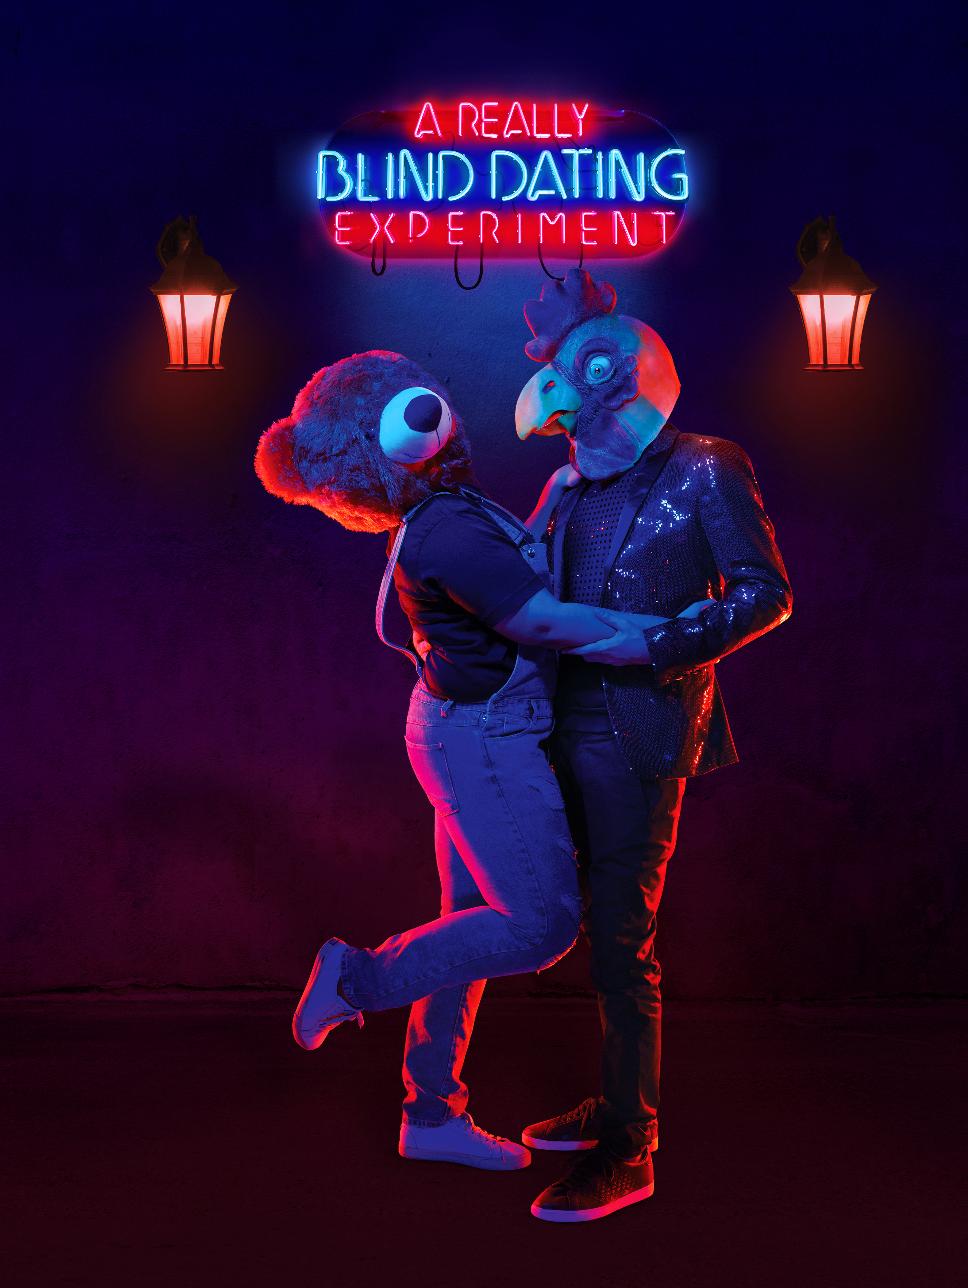 Dating Blind Date Speed Dating blindfold Mtv reality dark neon uv lights animals mask